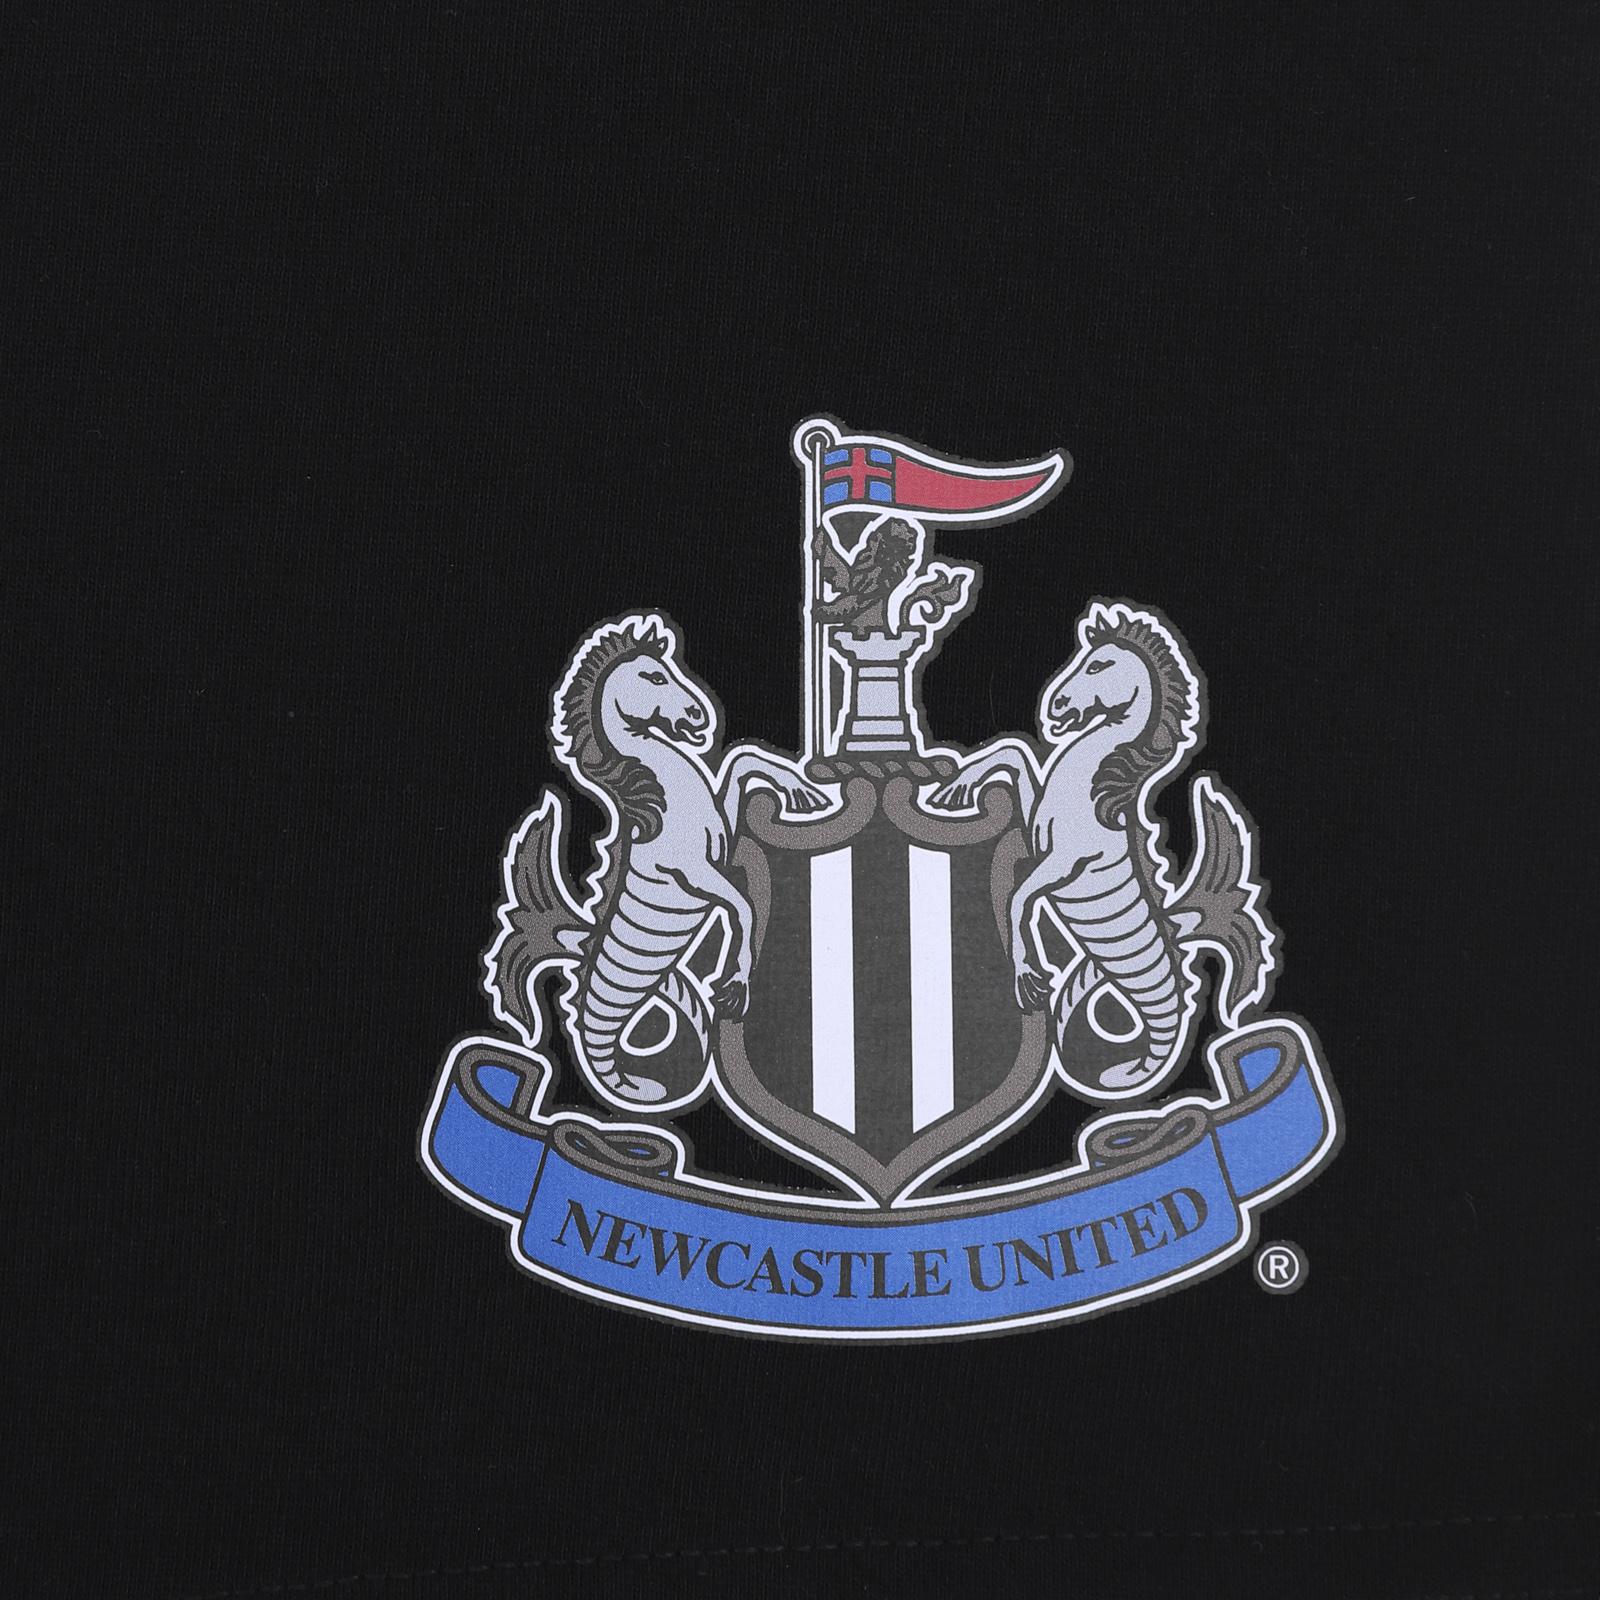 Newcastle-United-FC-Official-Football-Gift-Boys-Short-Pyjamas thumbnail 11